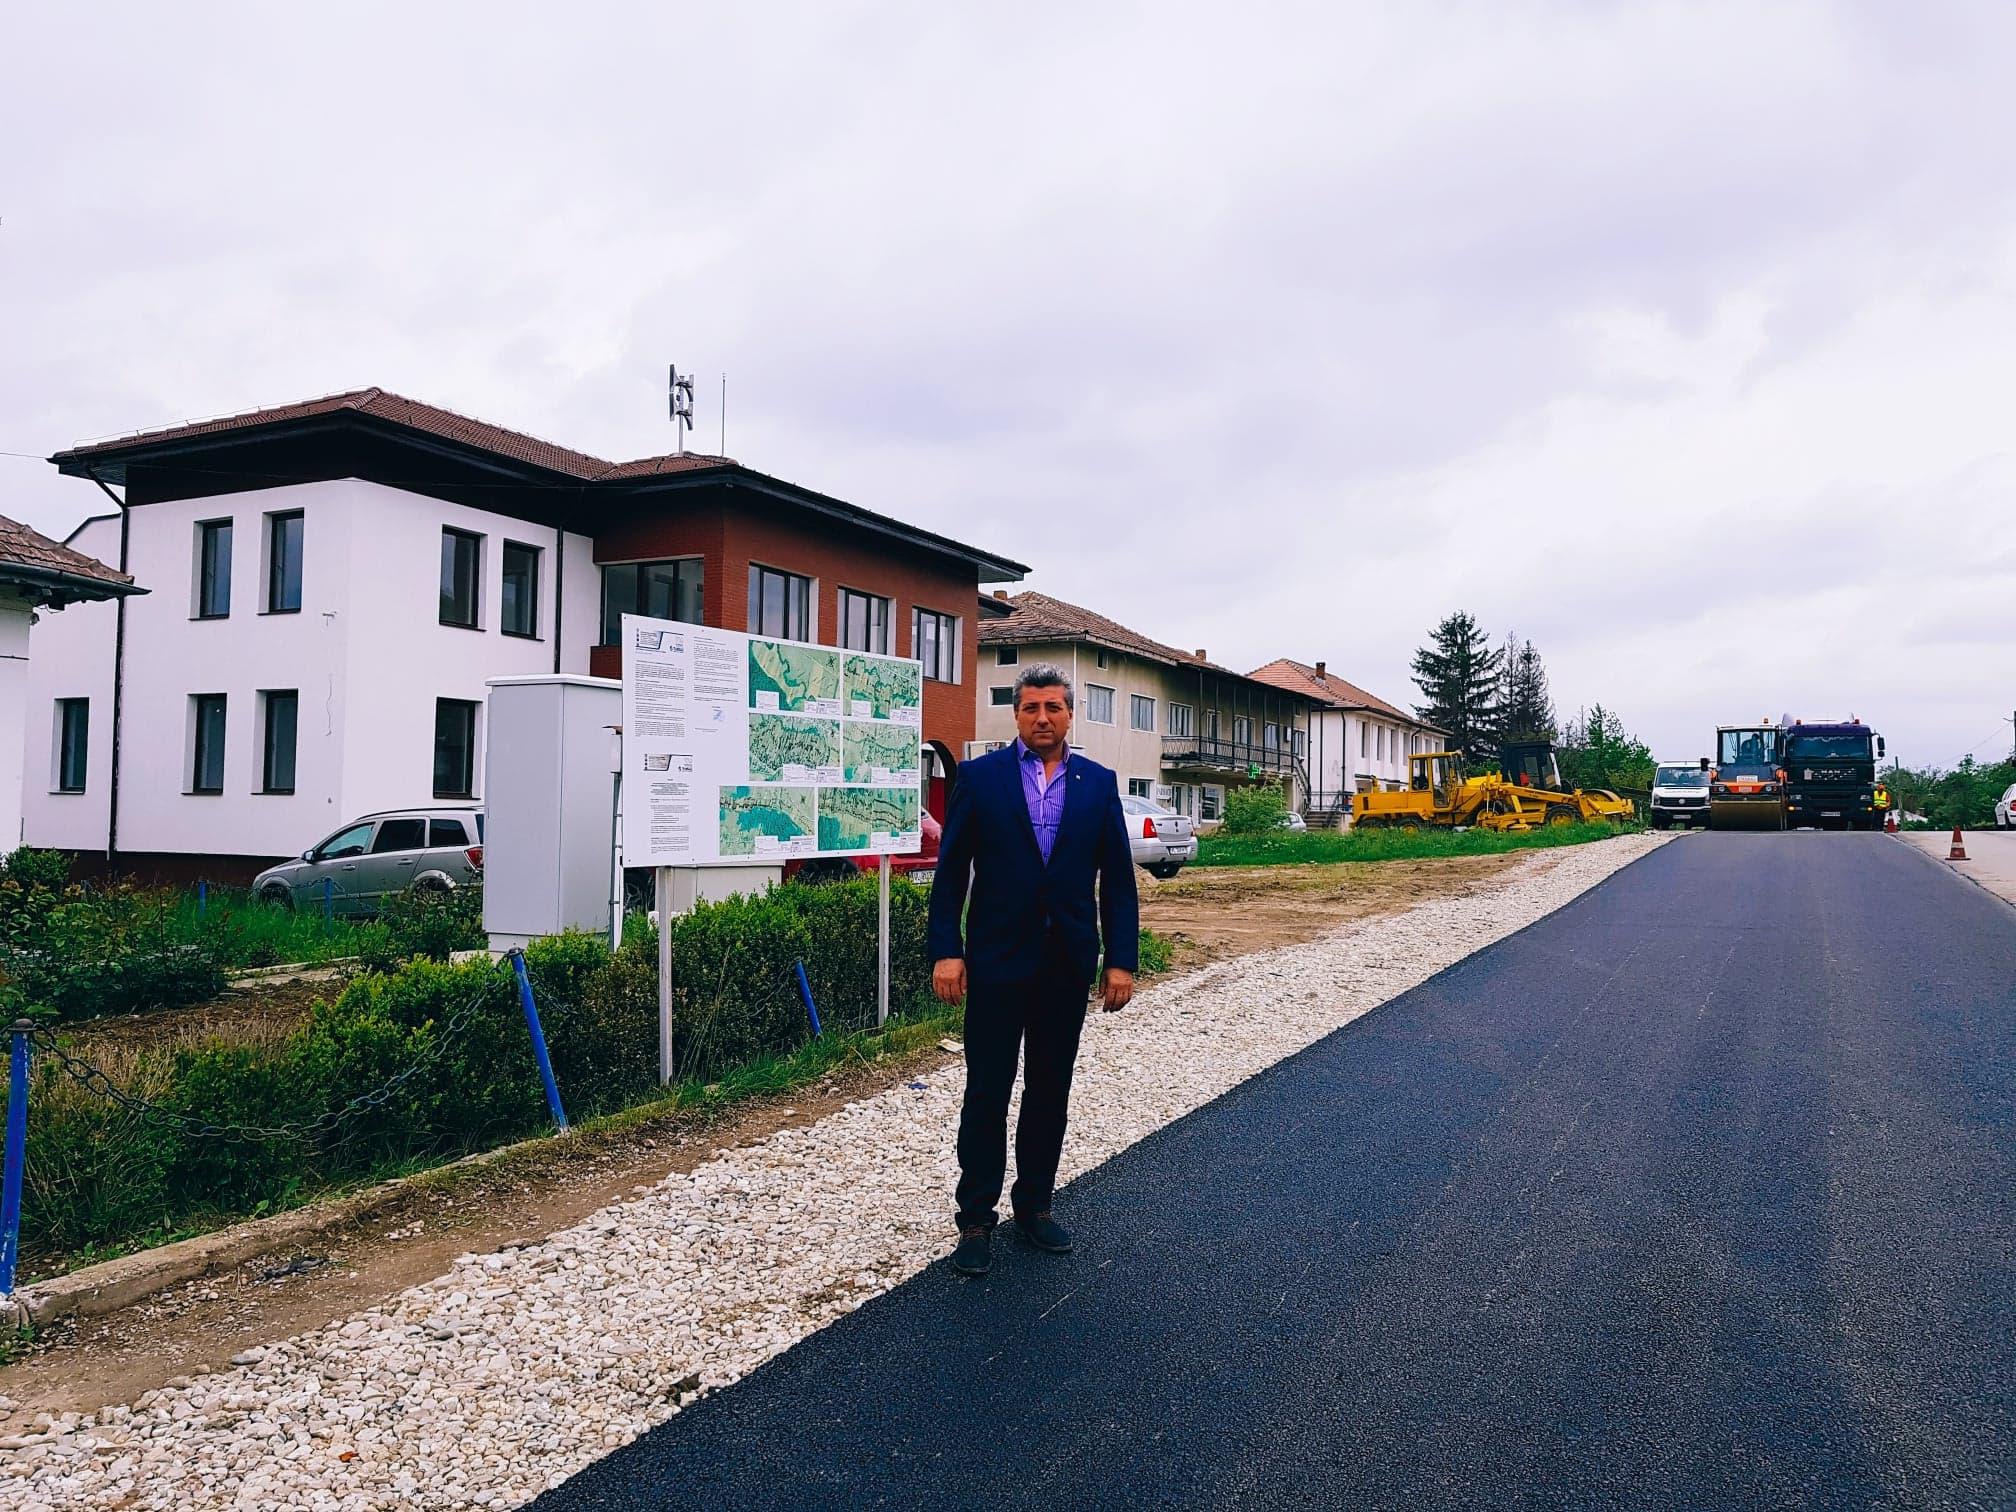 Investiţii finalizate cu succes de primarul Nicolae Concioiu